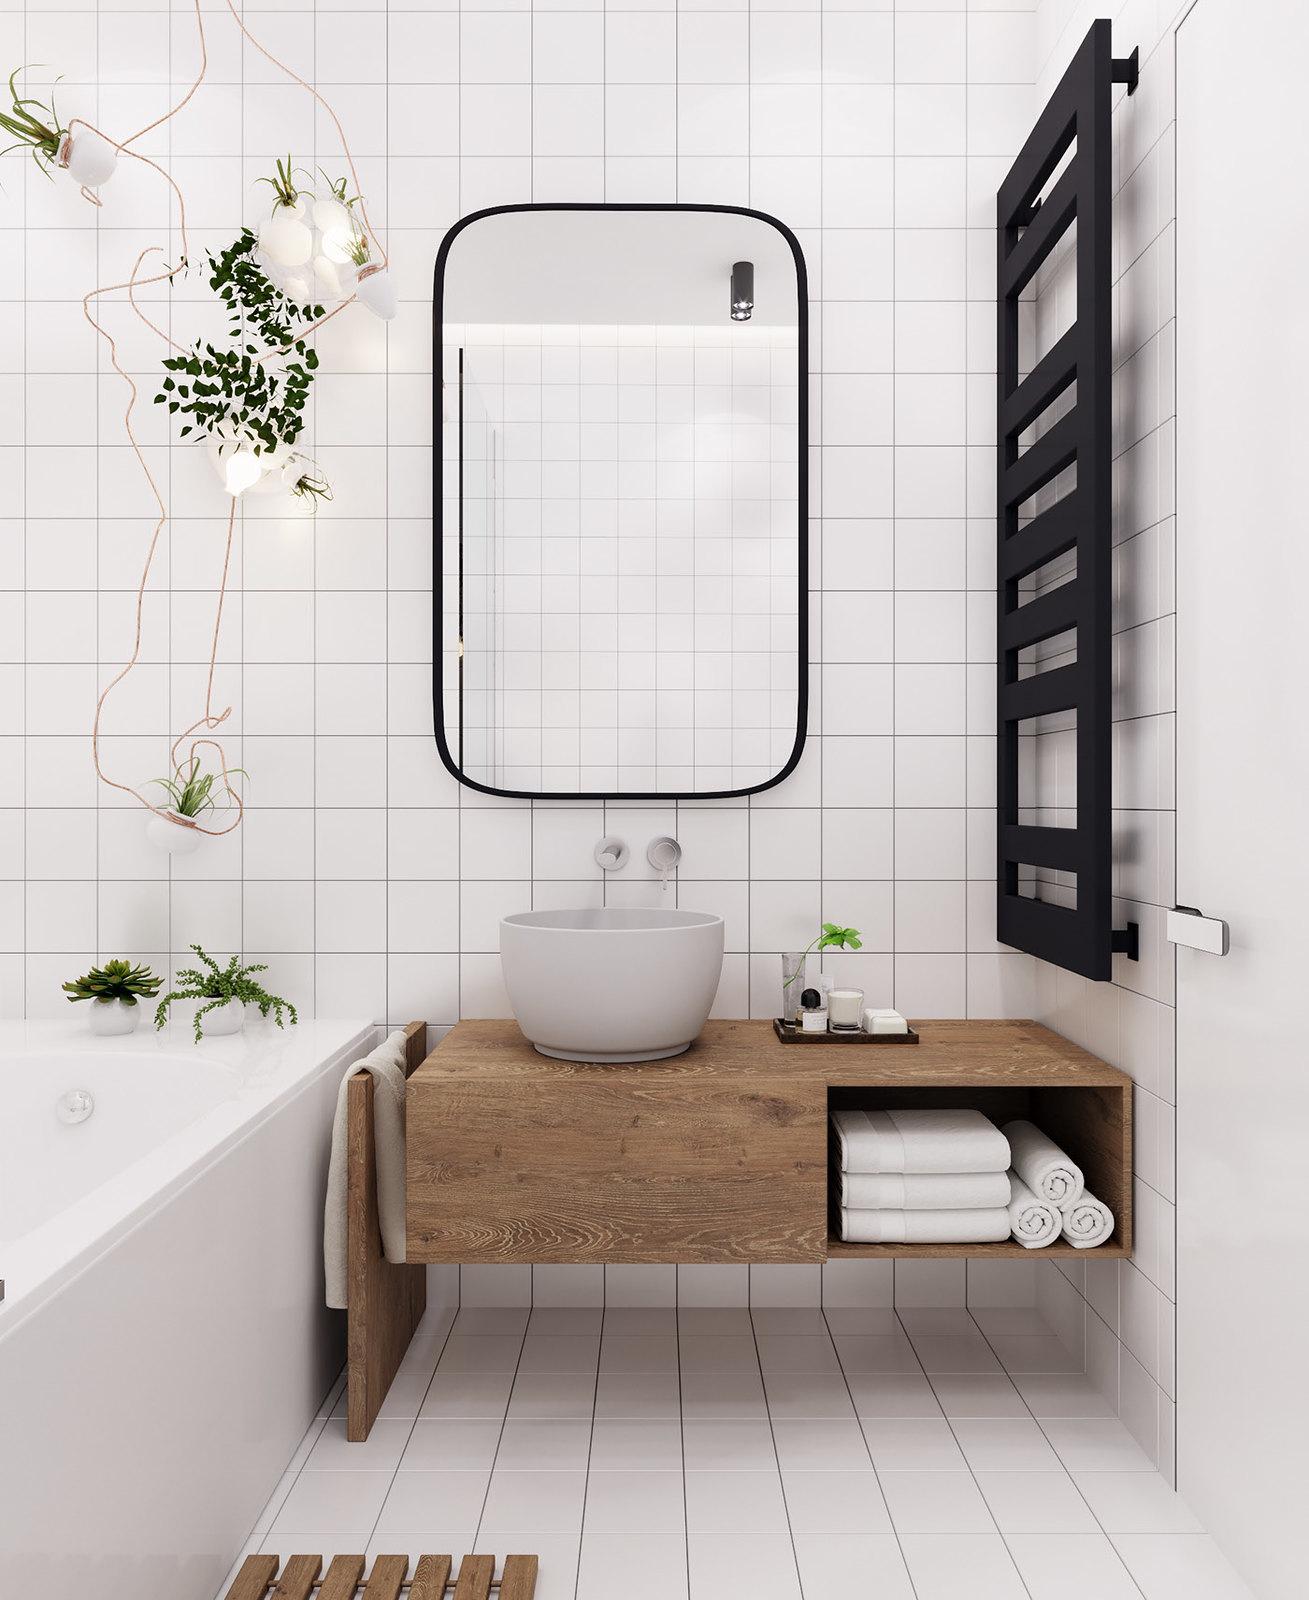 Scandinavian Style Minimalist Bathroom | Monochromatic White Simple Bathroom | Square Subway Tile | Tiny Bathroom Design | Home Inspiration